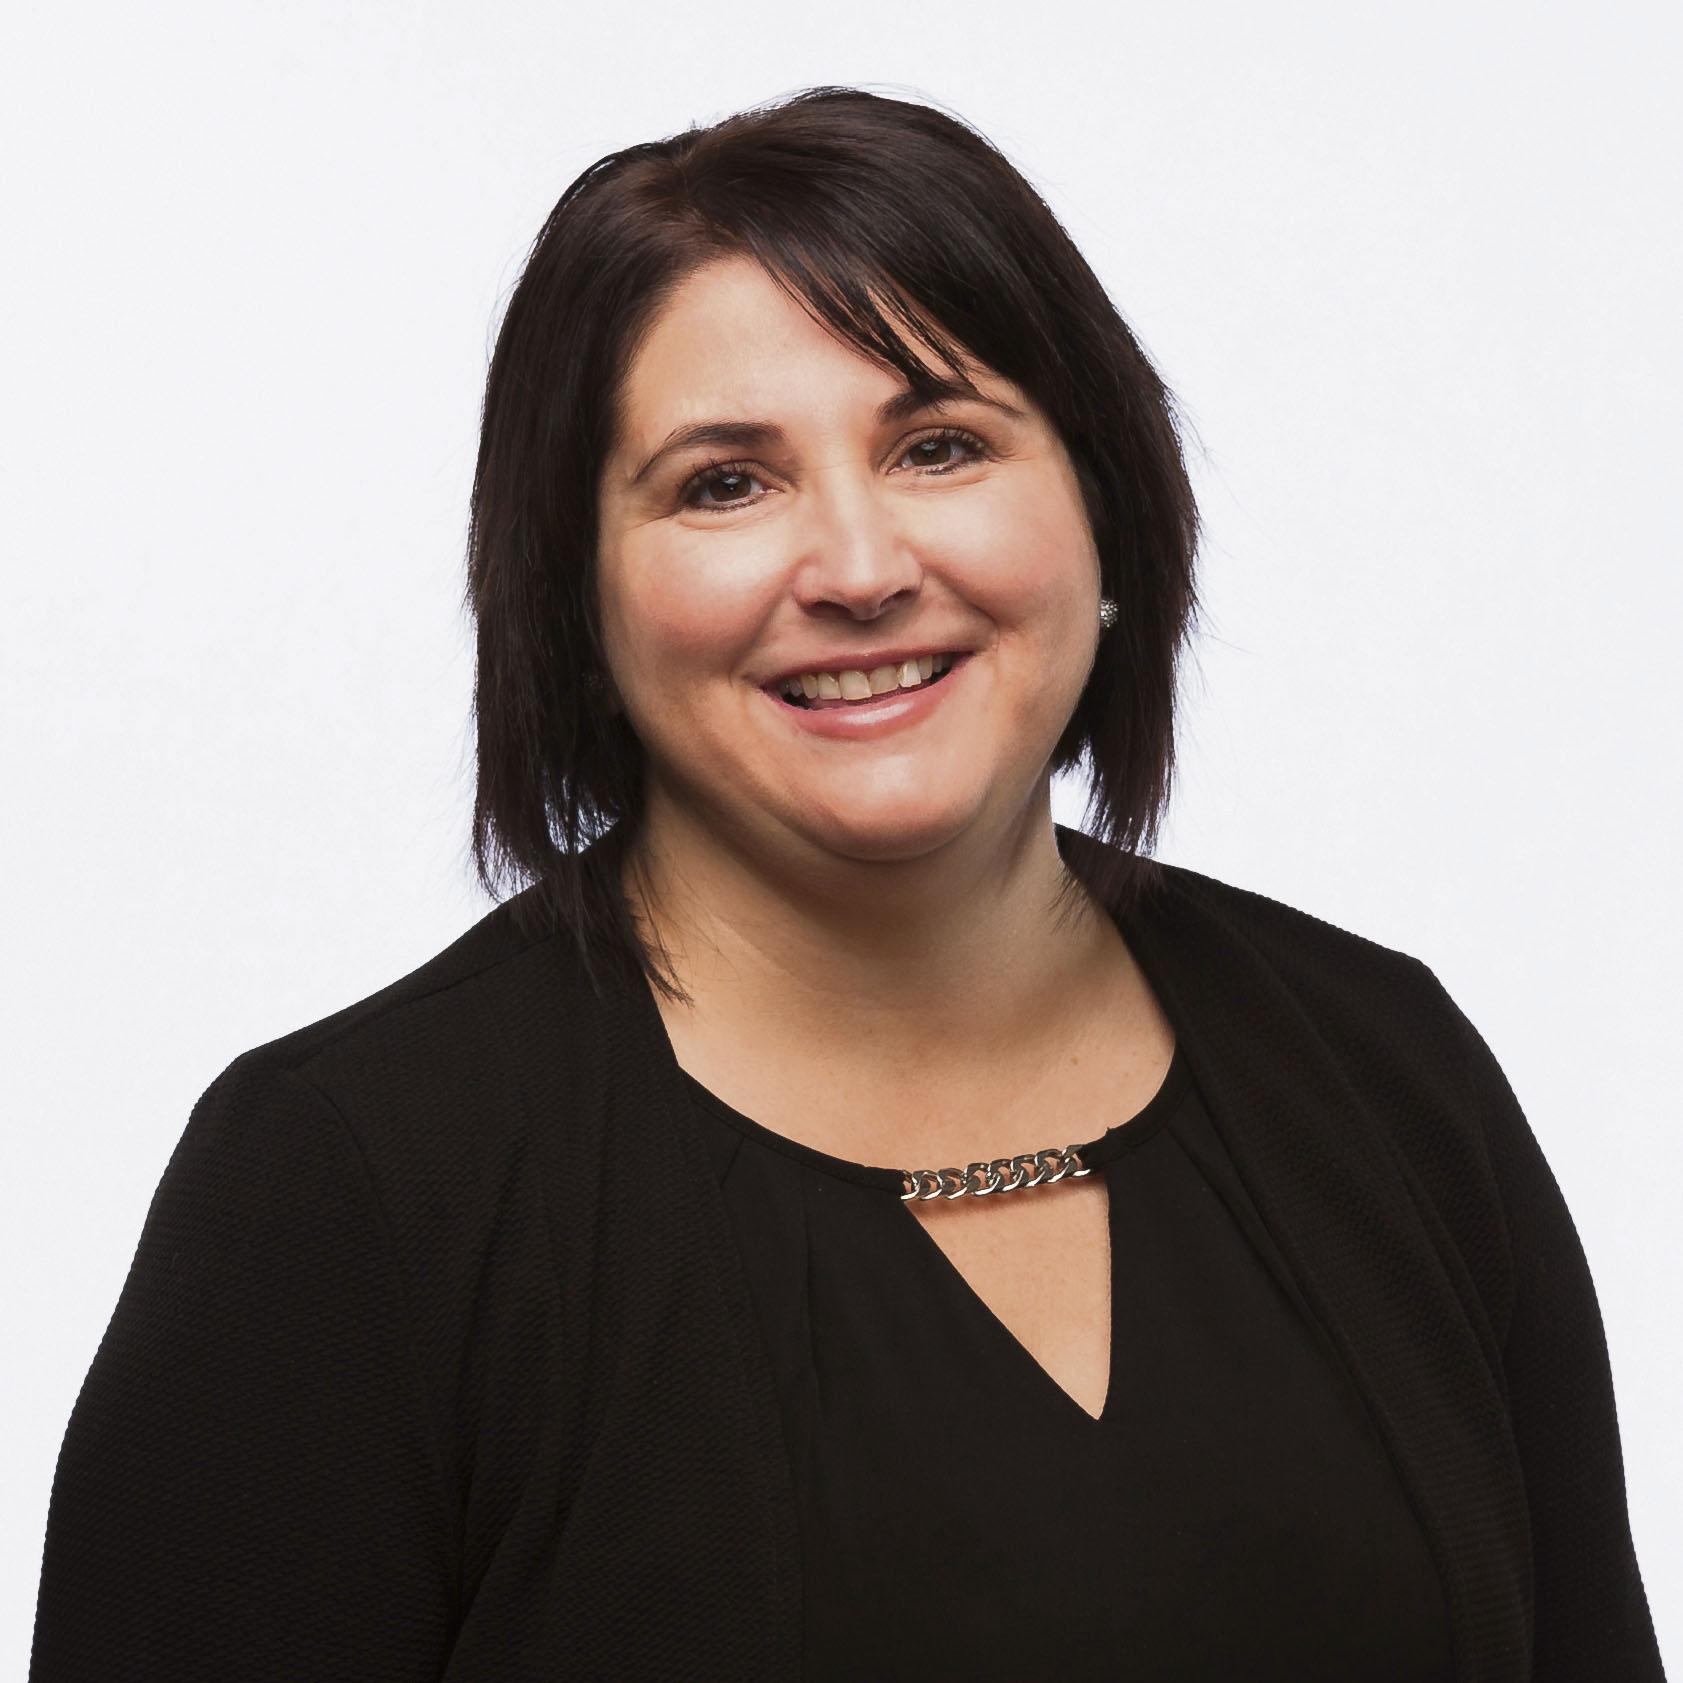 Nicole Rancourt